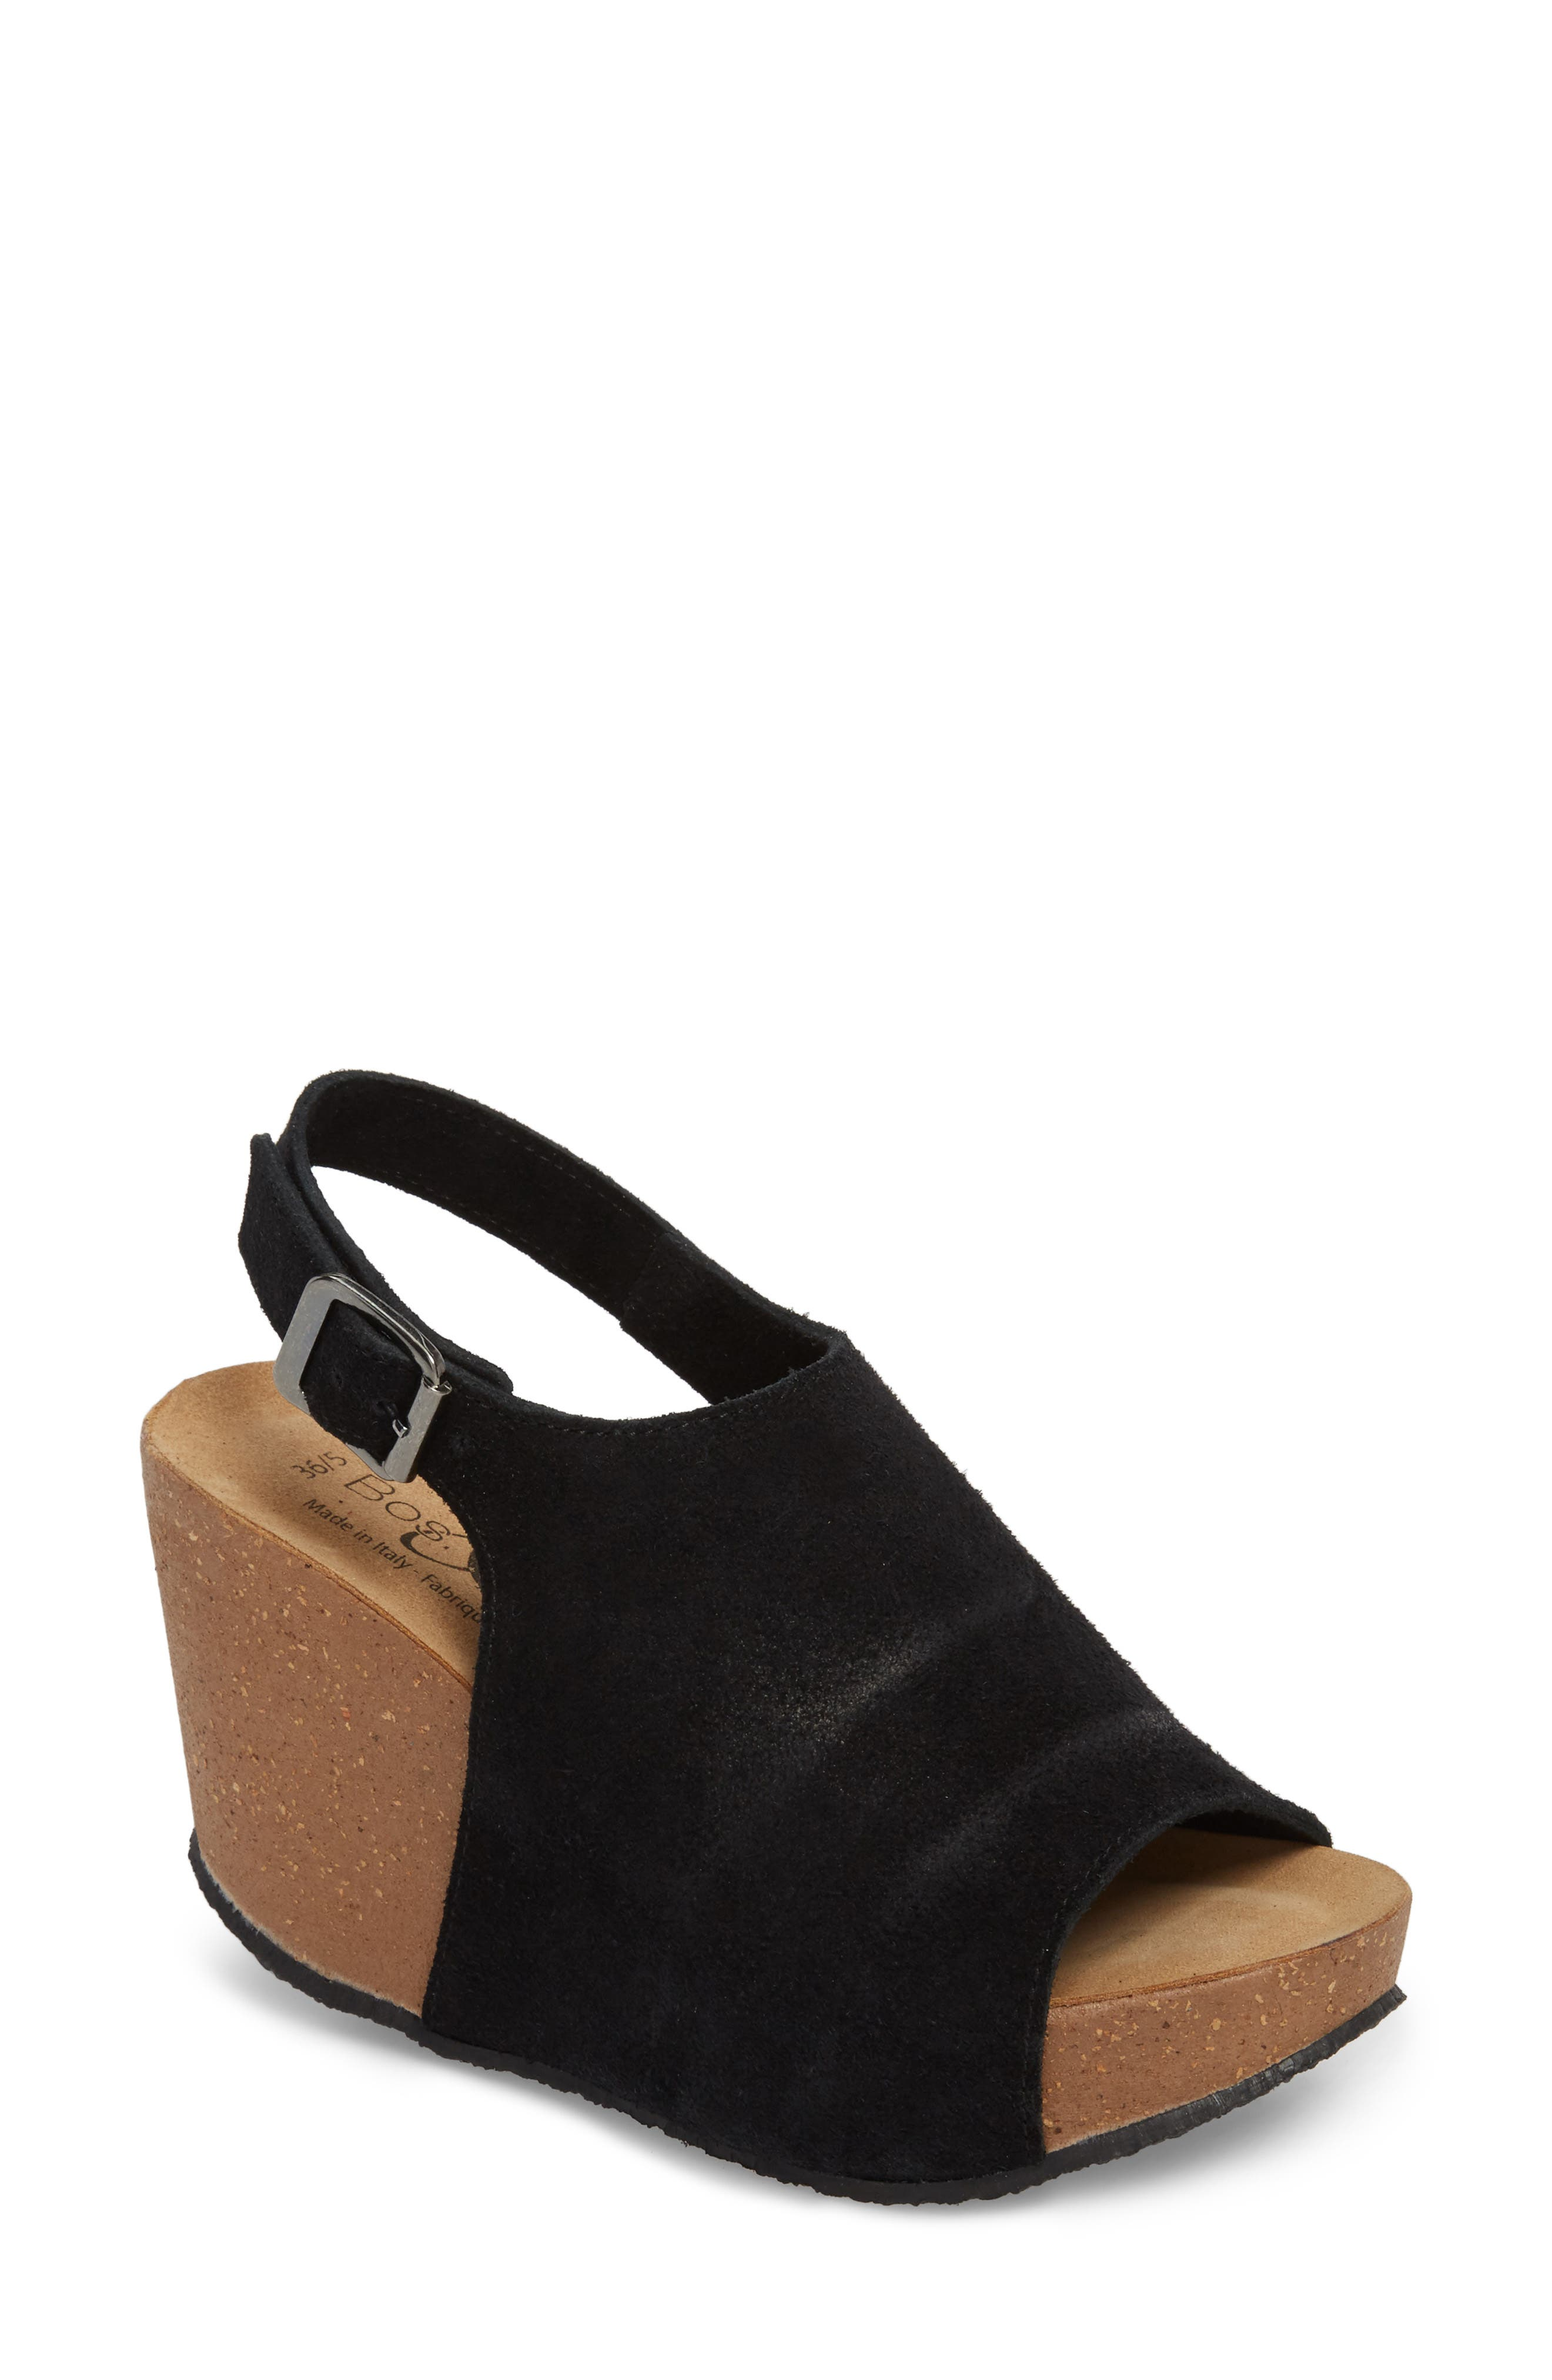 BOS. & CO. Sheila Platform Wedge Sandal, Main, color, BLACK NUBUCK